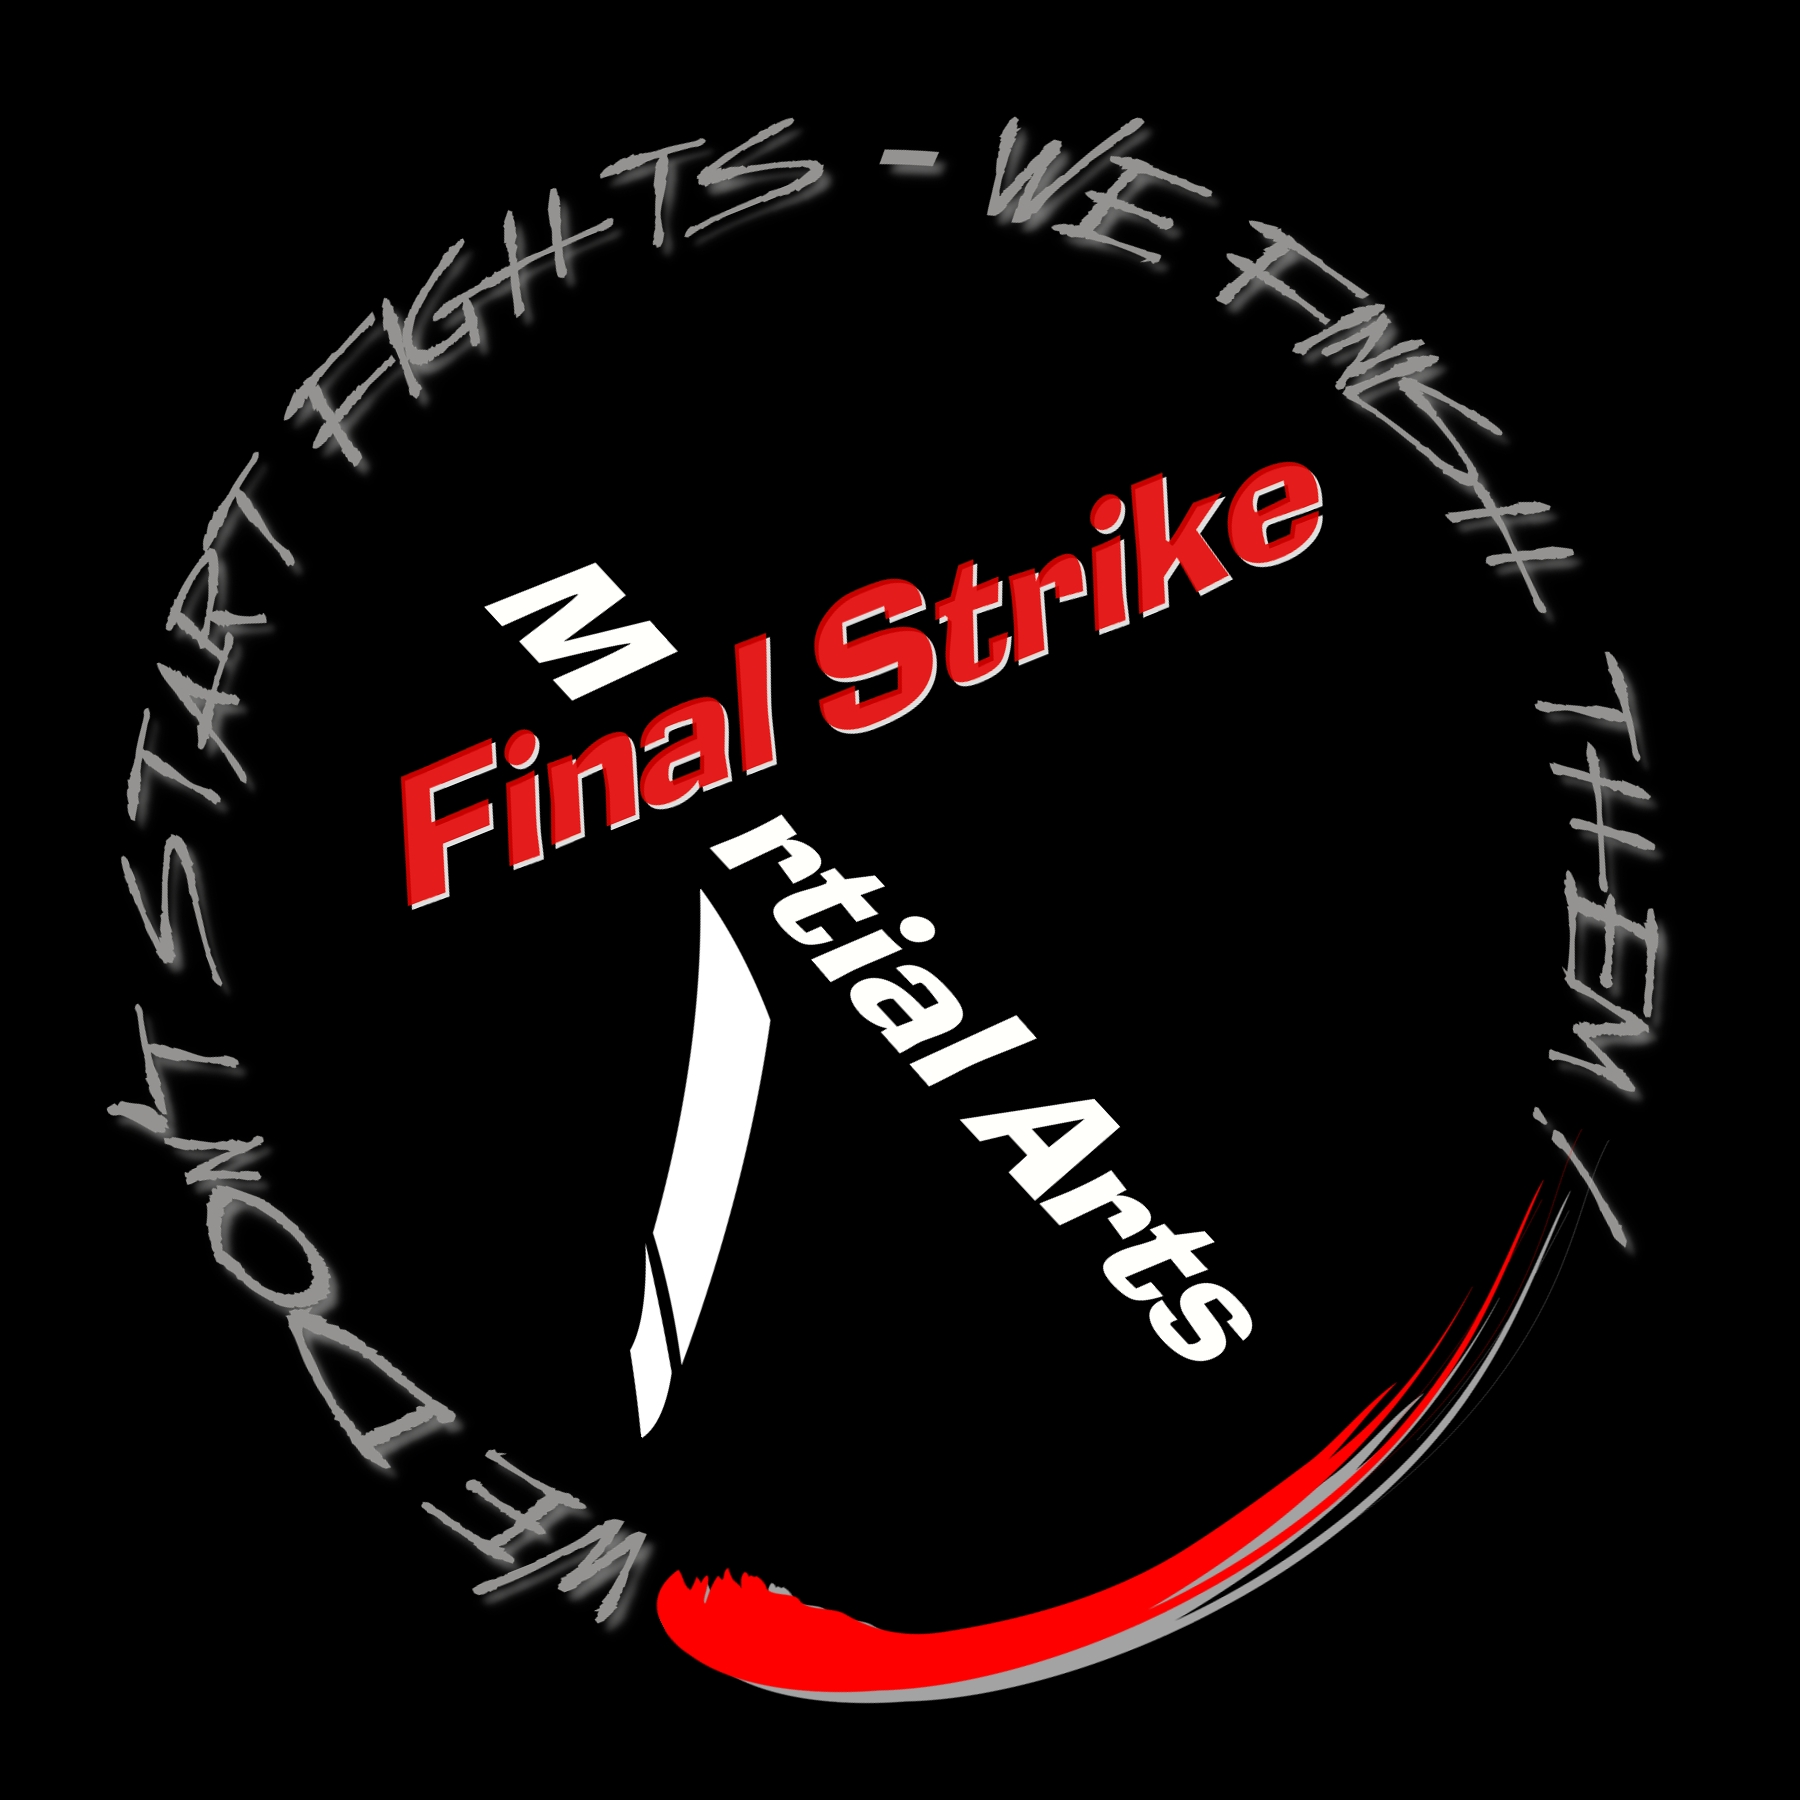 Final Strike Martial Arts